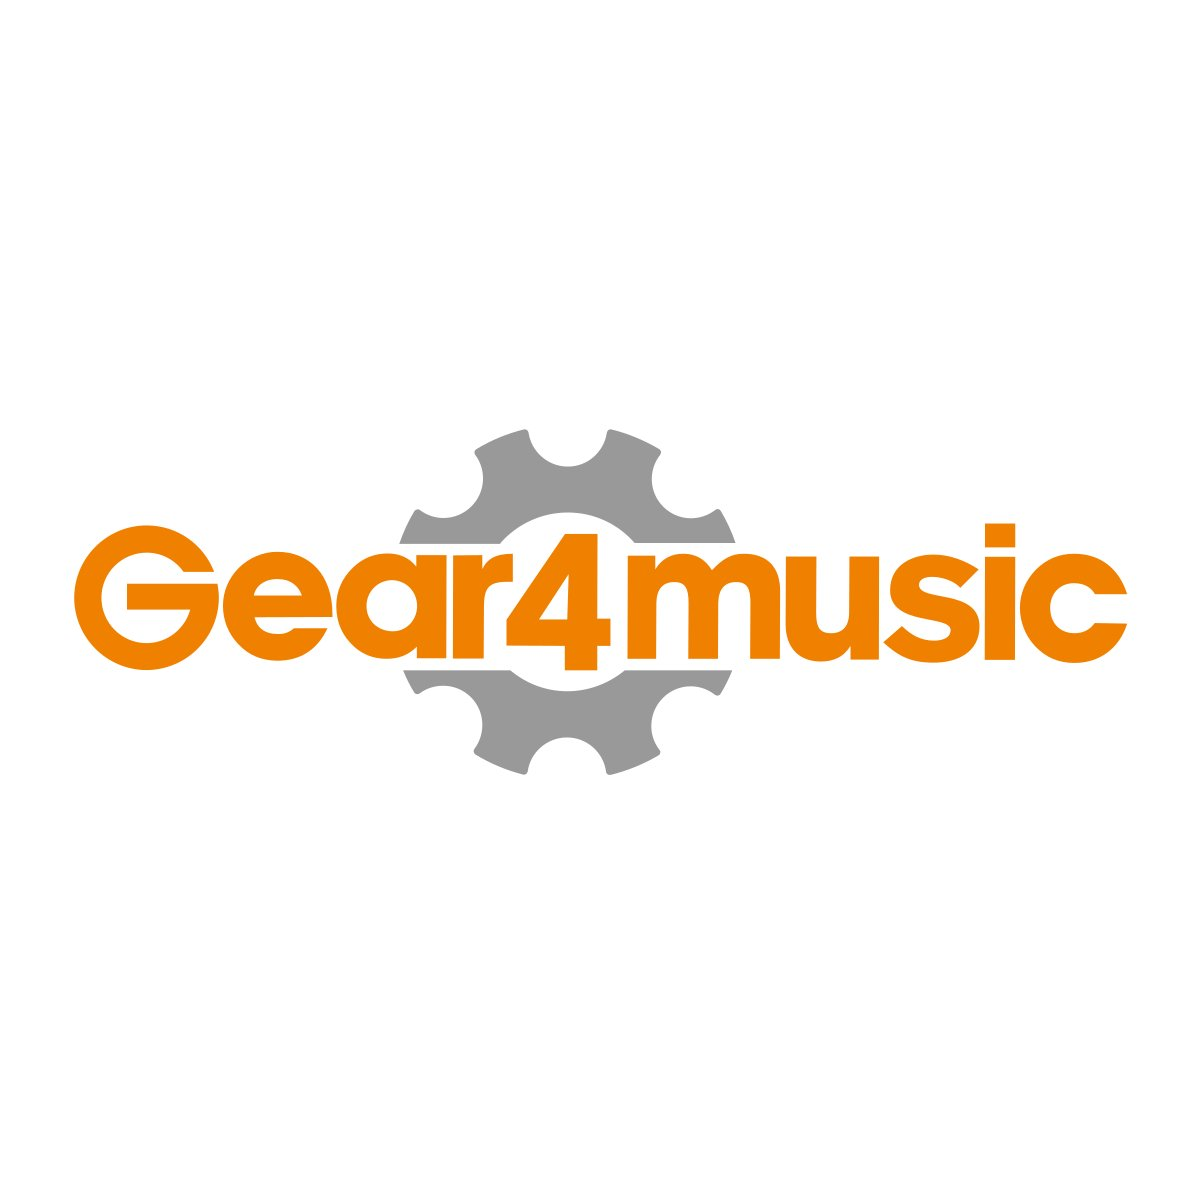 D'Addario Select Jazz Filed Baritone Saxophone Reeds 2H, Pack of 5